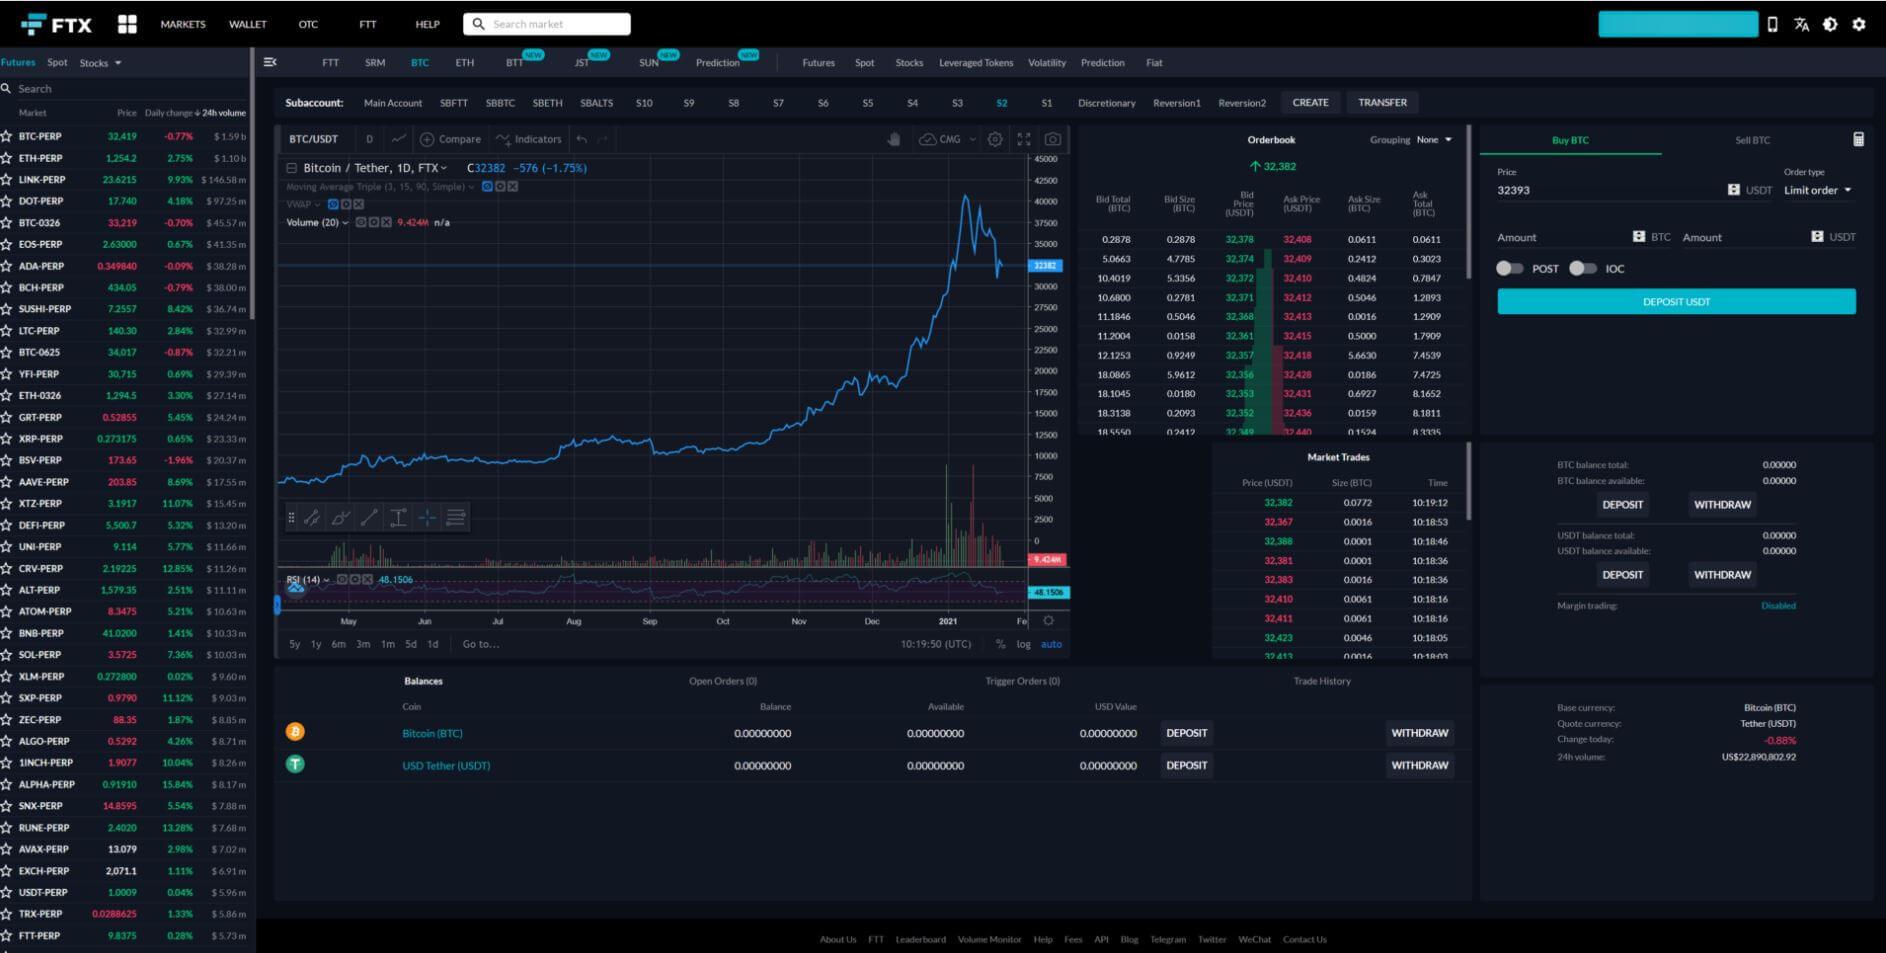 FTX Trading Platform Experience